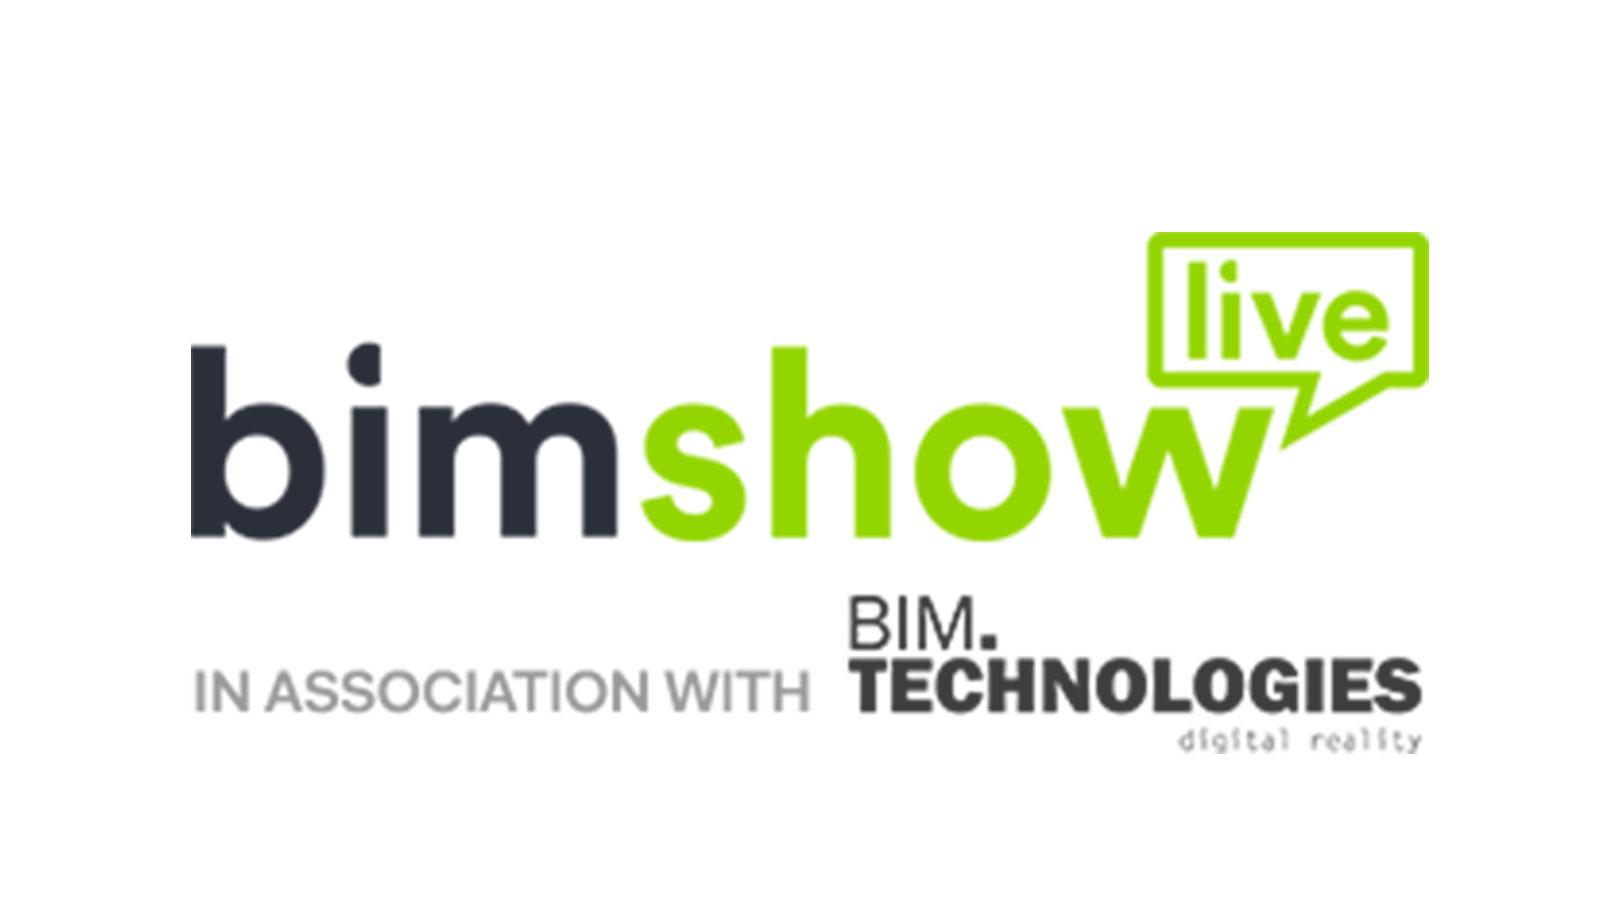 Asite Sponsors BIM Show live Scotland